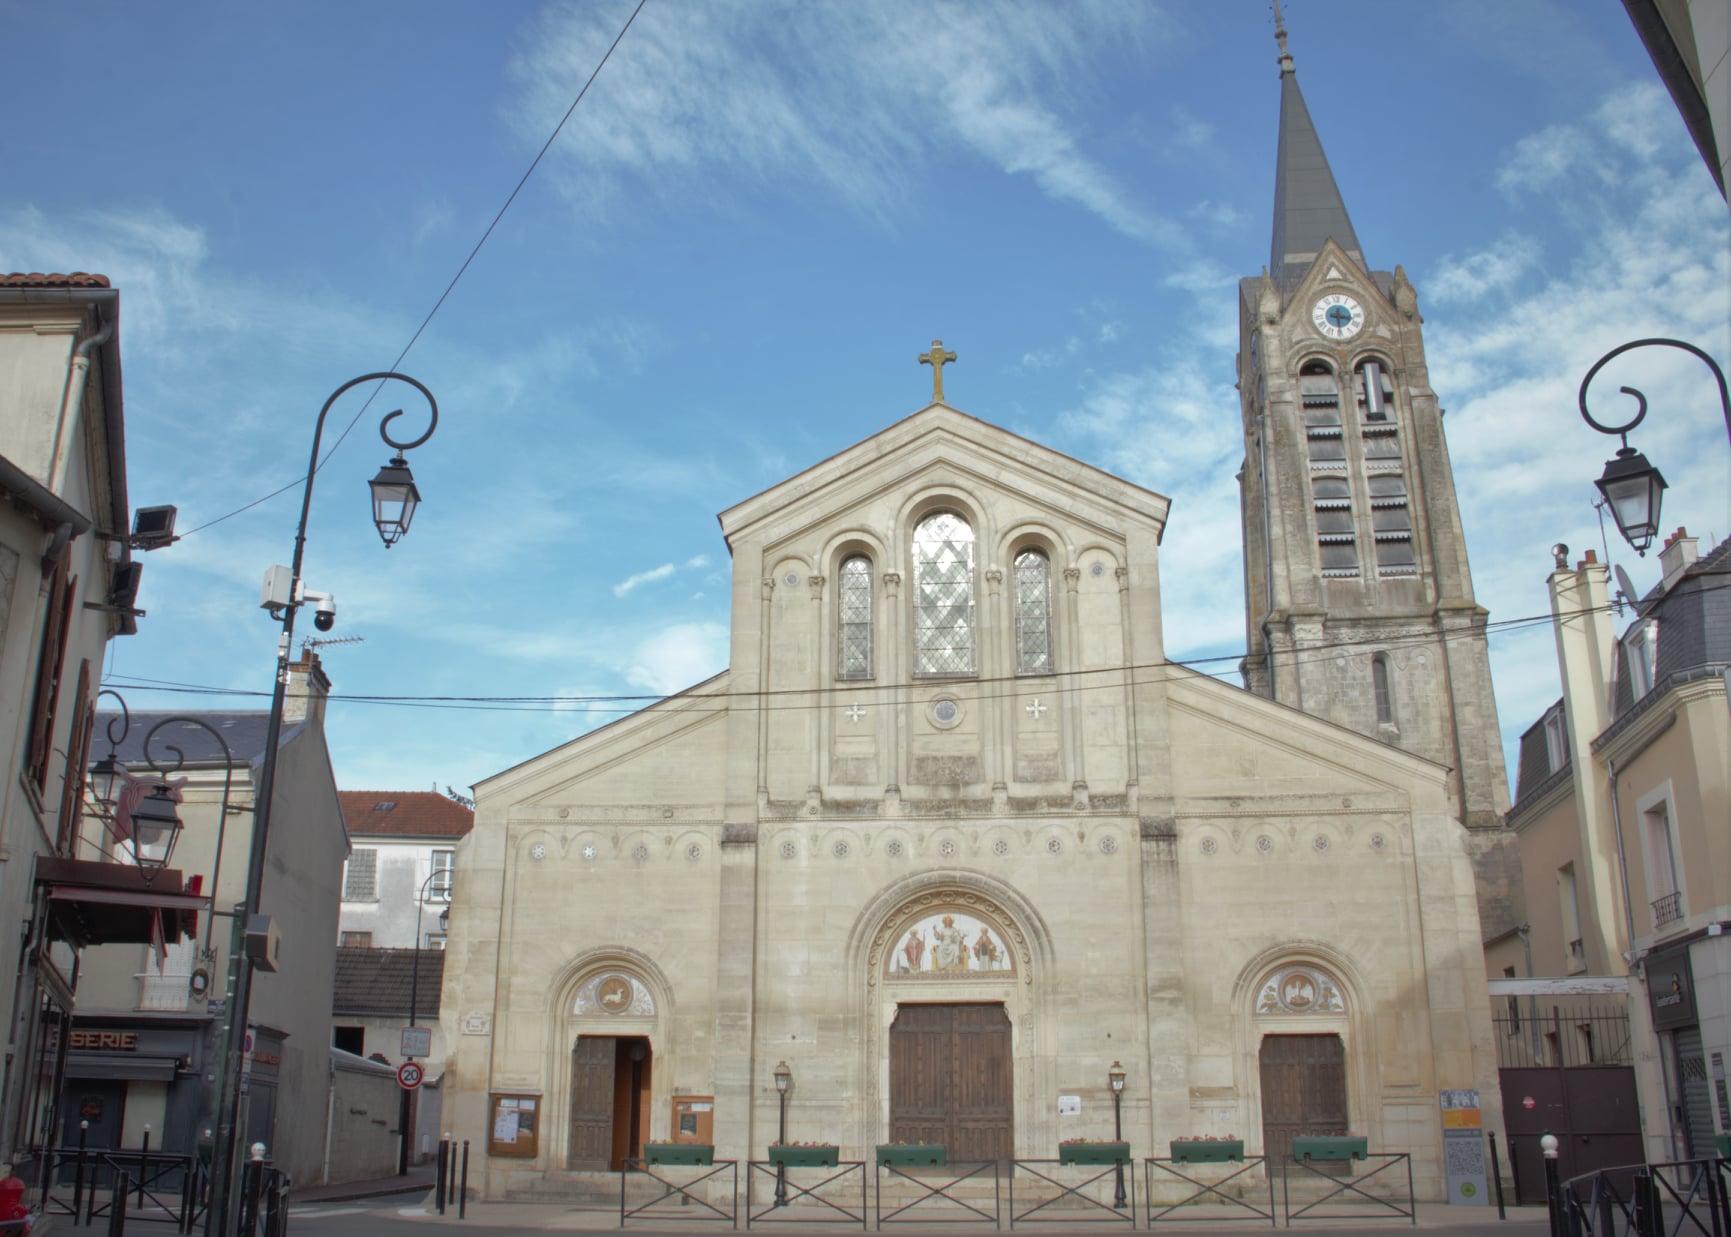 Eglise de Saint-Leu-la-Forêt (photo Patrick Danielou)